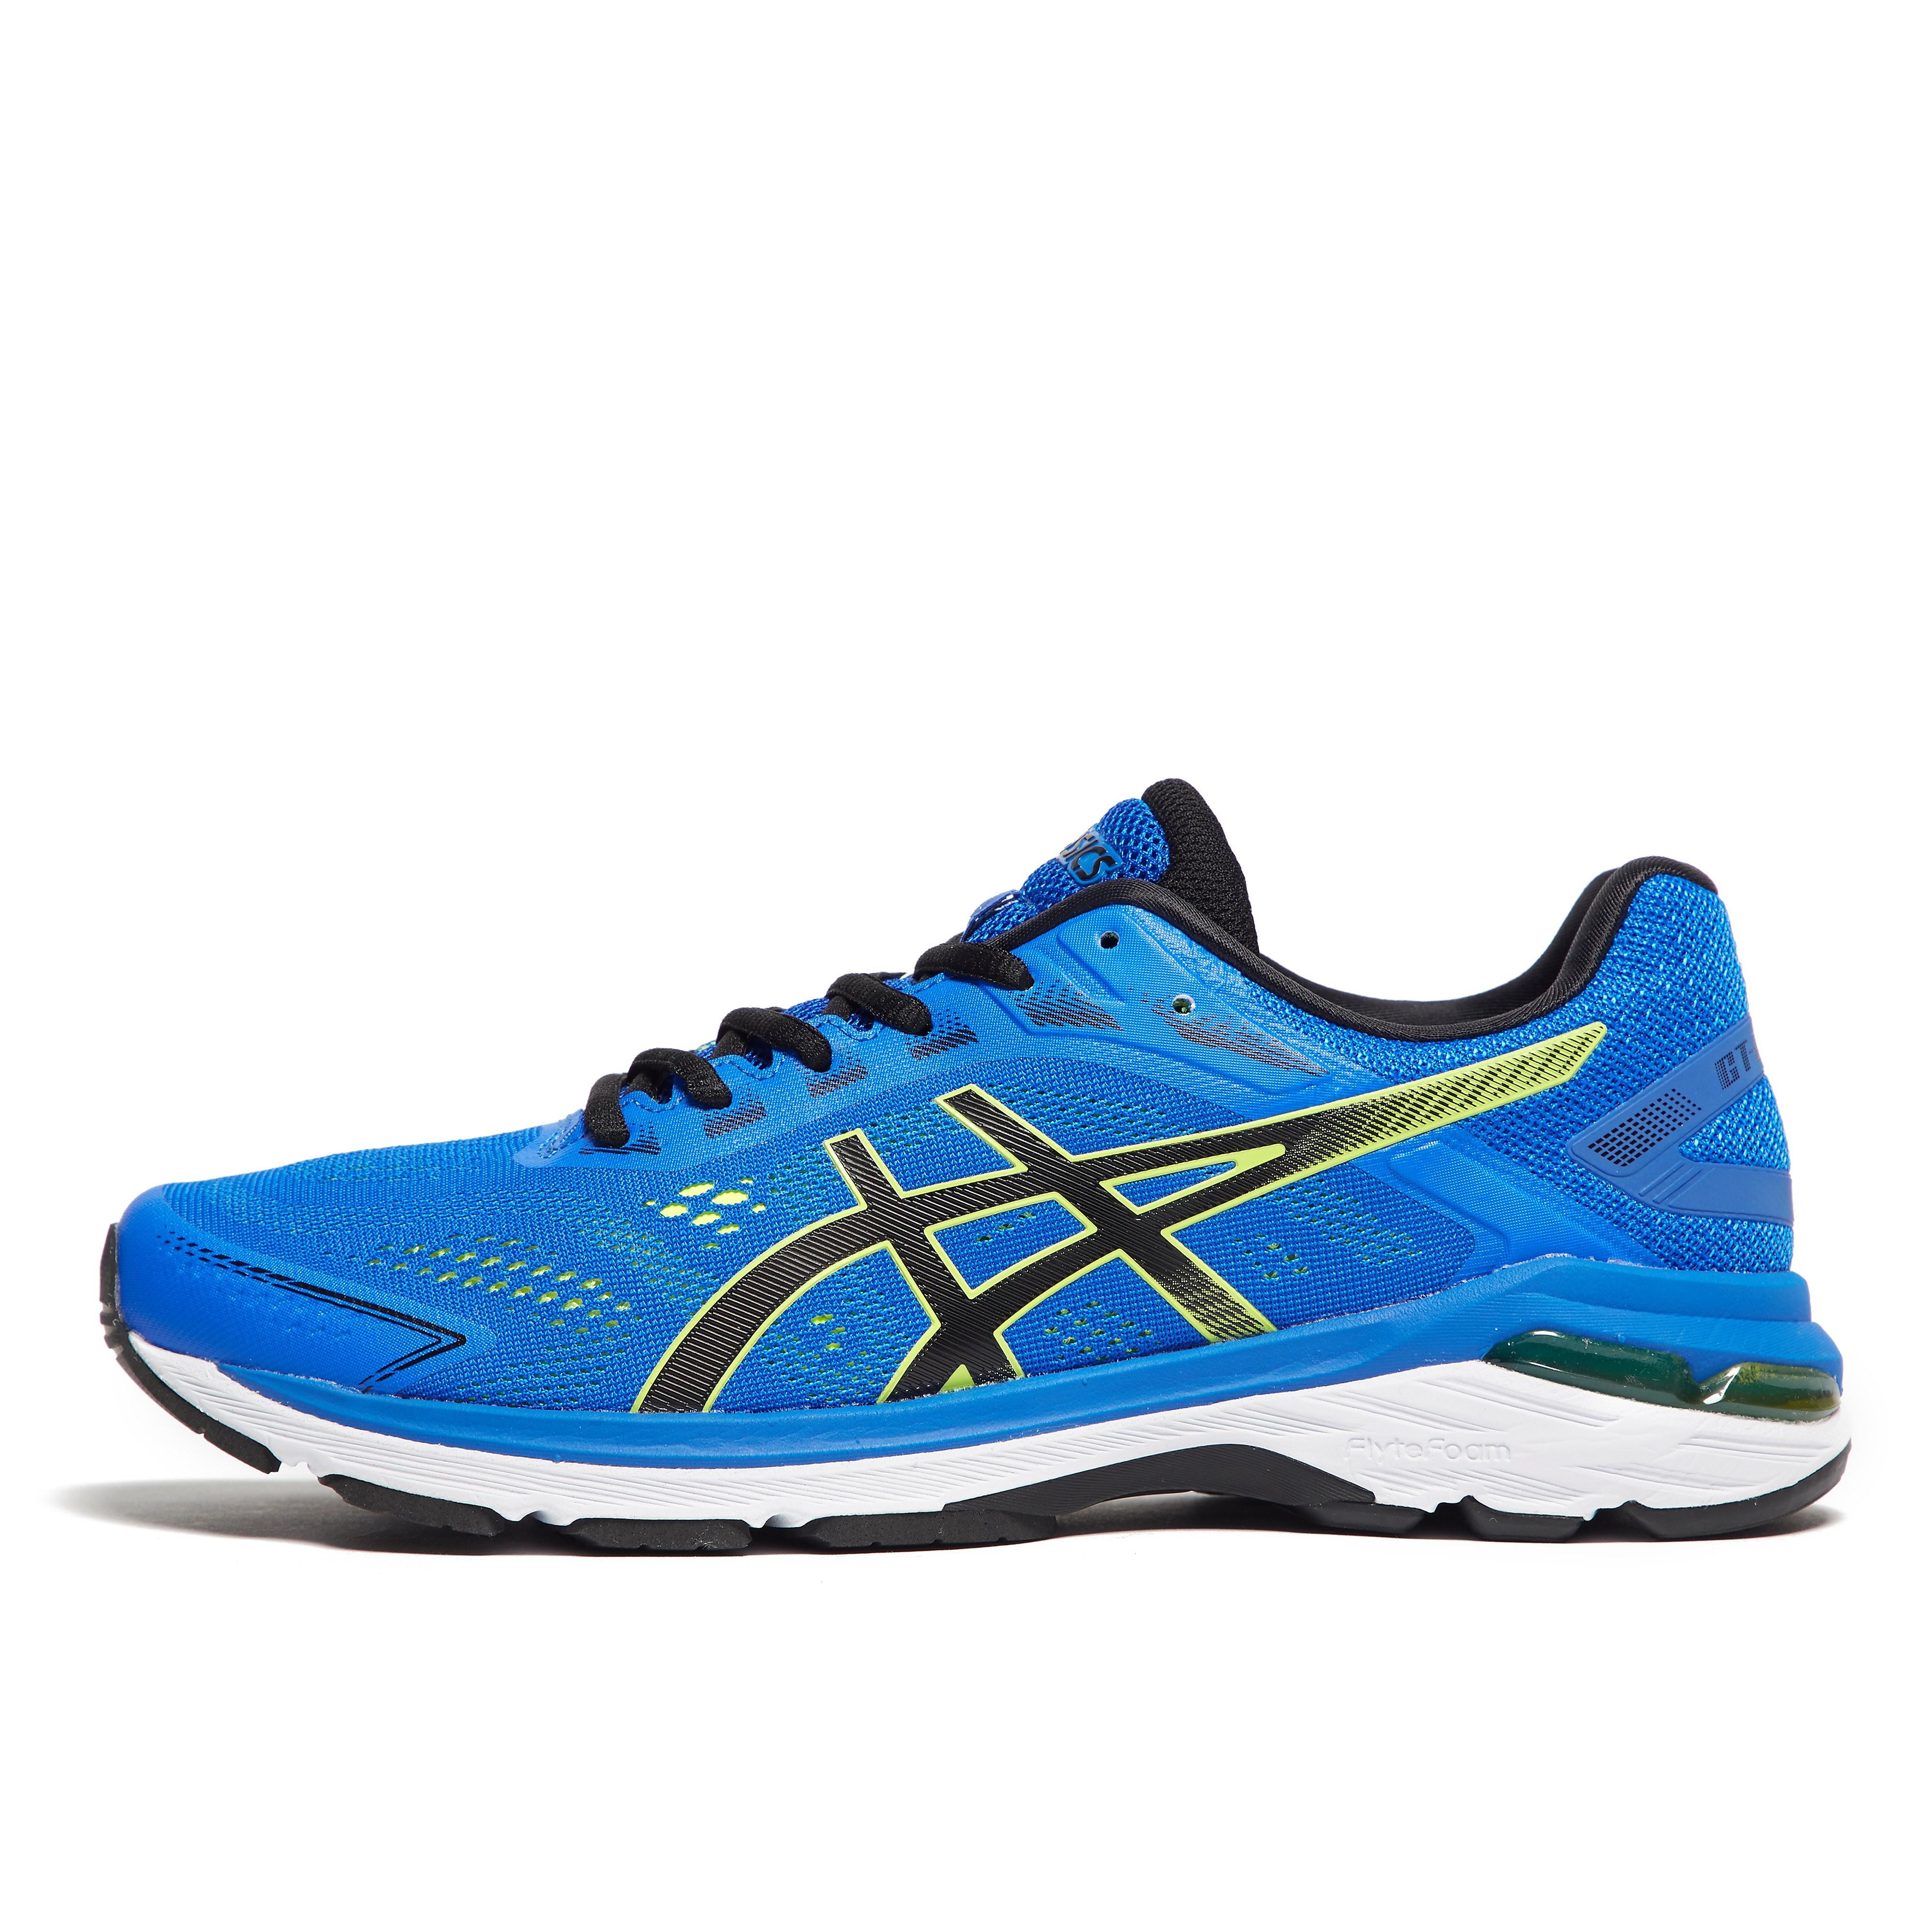 Mens Blue ASICS GT-2000 7 Running Shoes